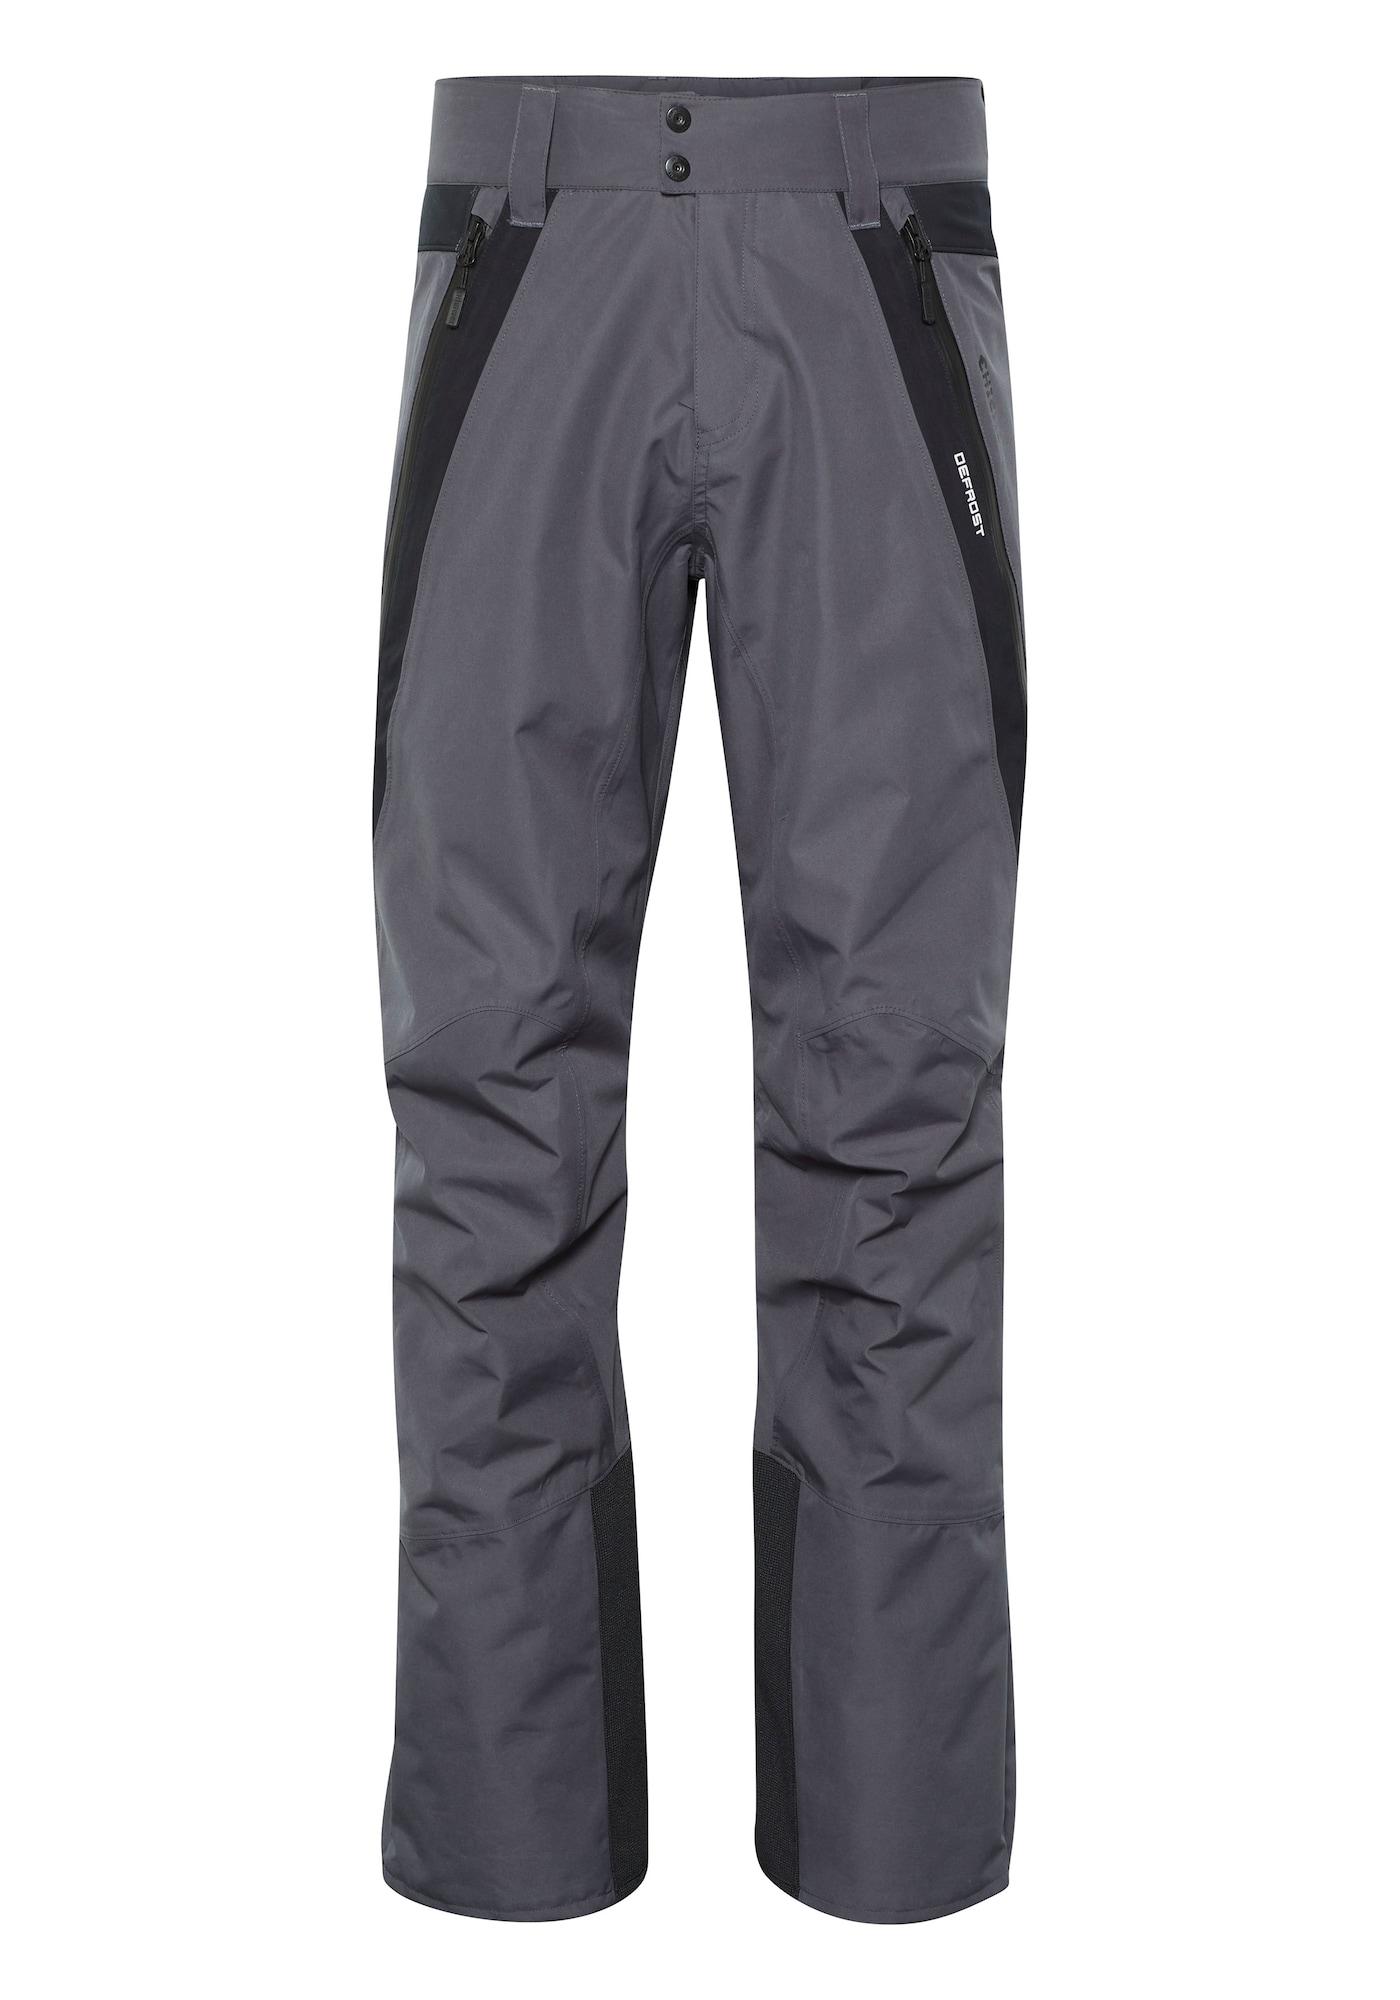 CHIEMSEE Outdoorové kalhoty 'SNOWMASS'  tmavě šedá / černá